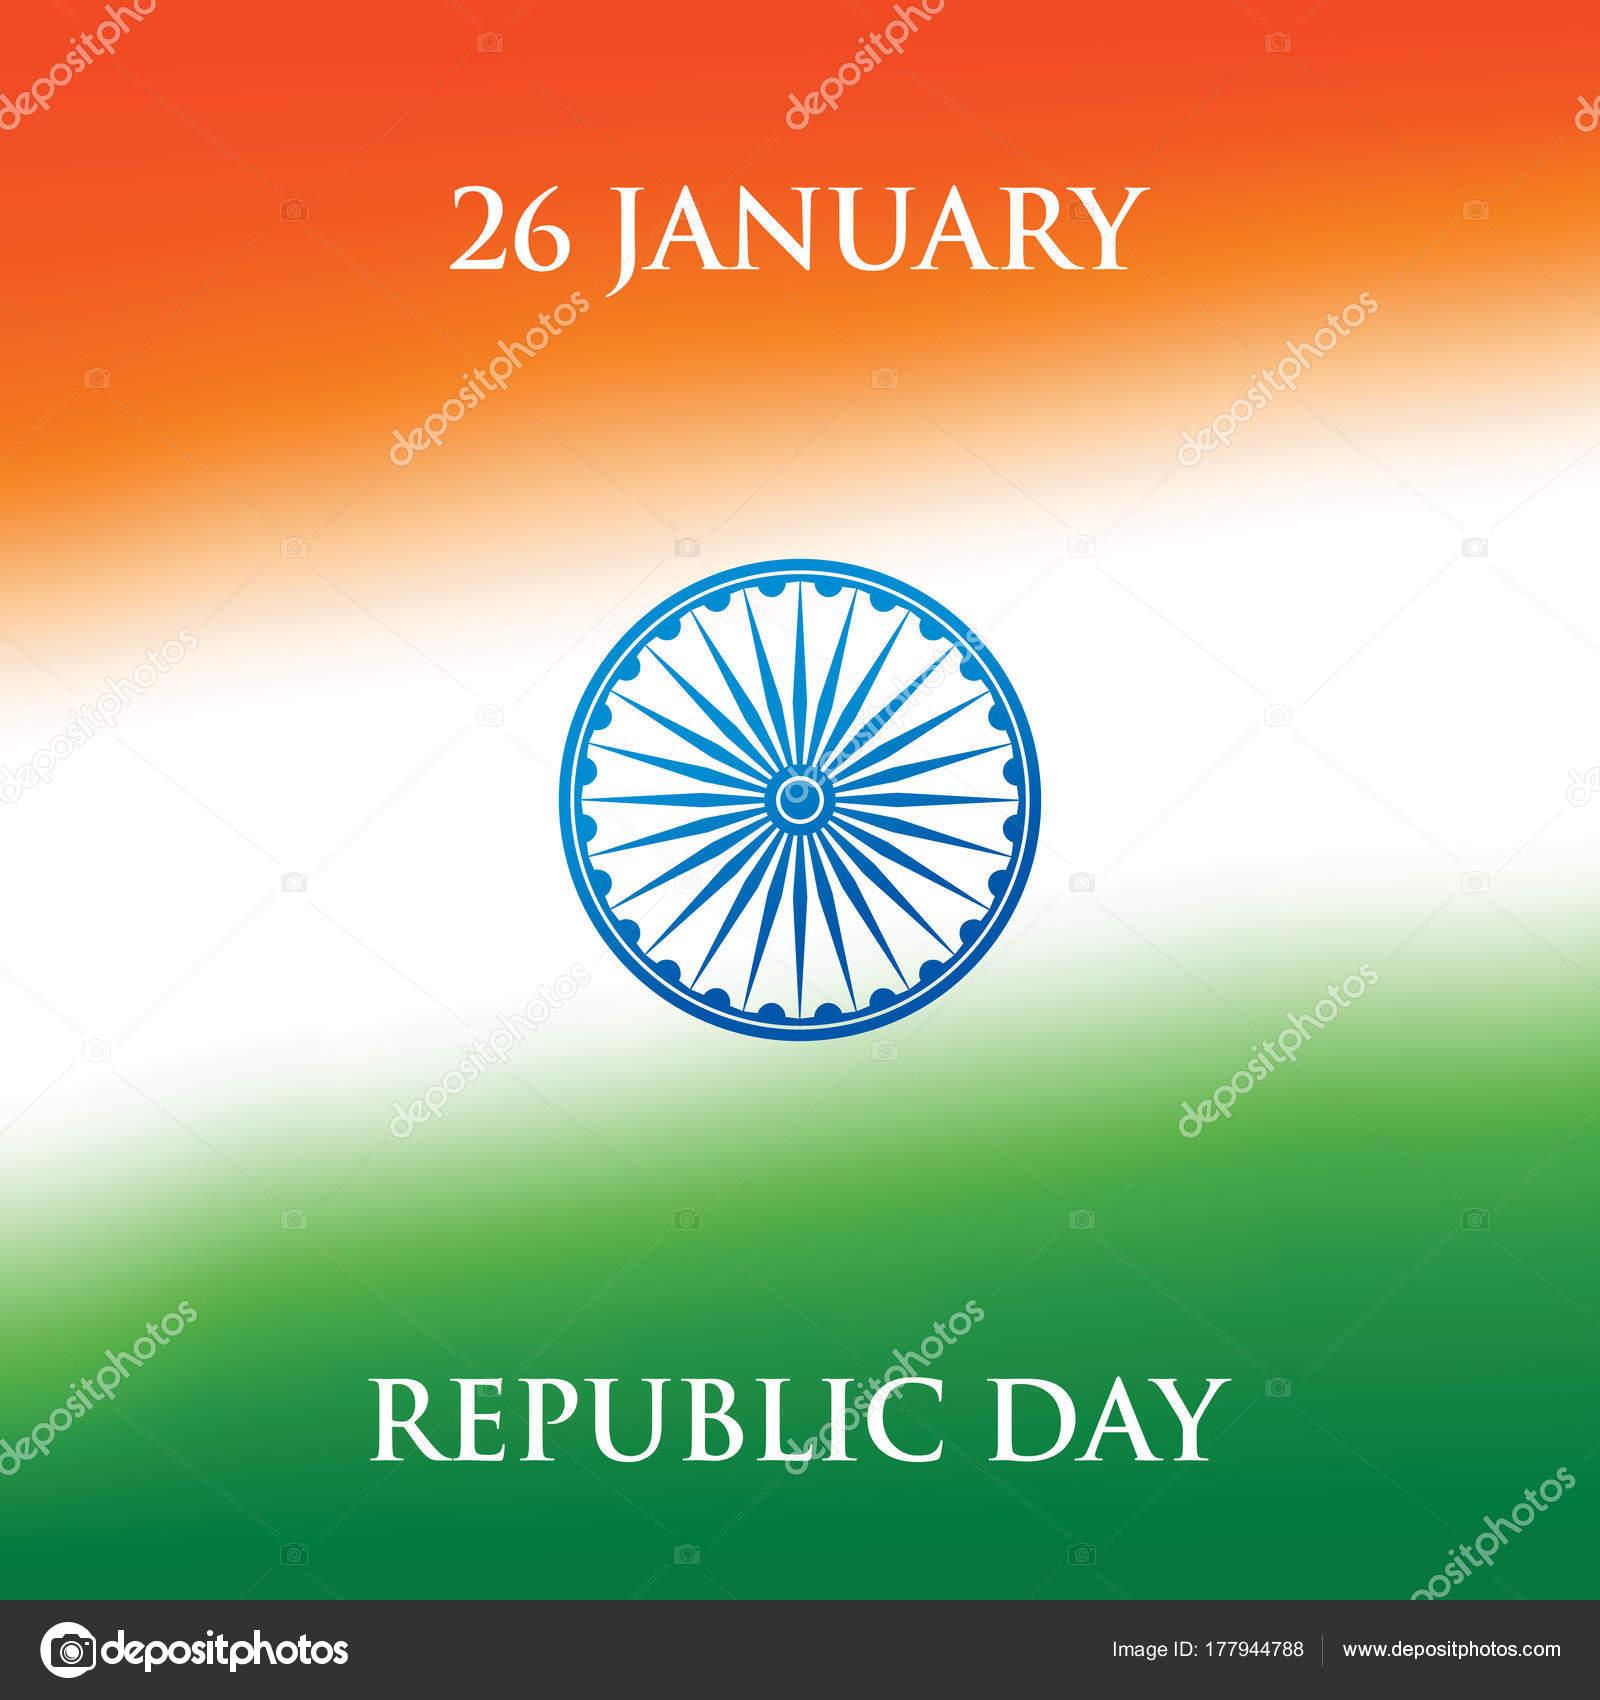 India republic day greeting card design vector illustration january india republic day greeting card design vector illustration january republic stock vector m4hsunfo